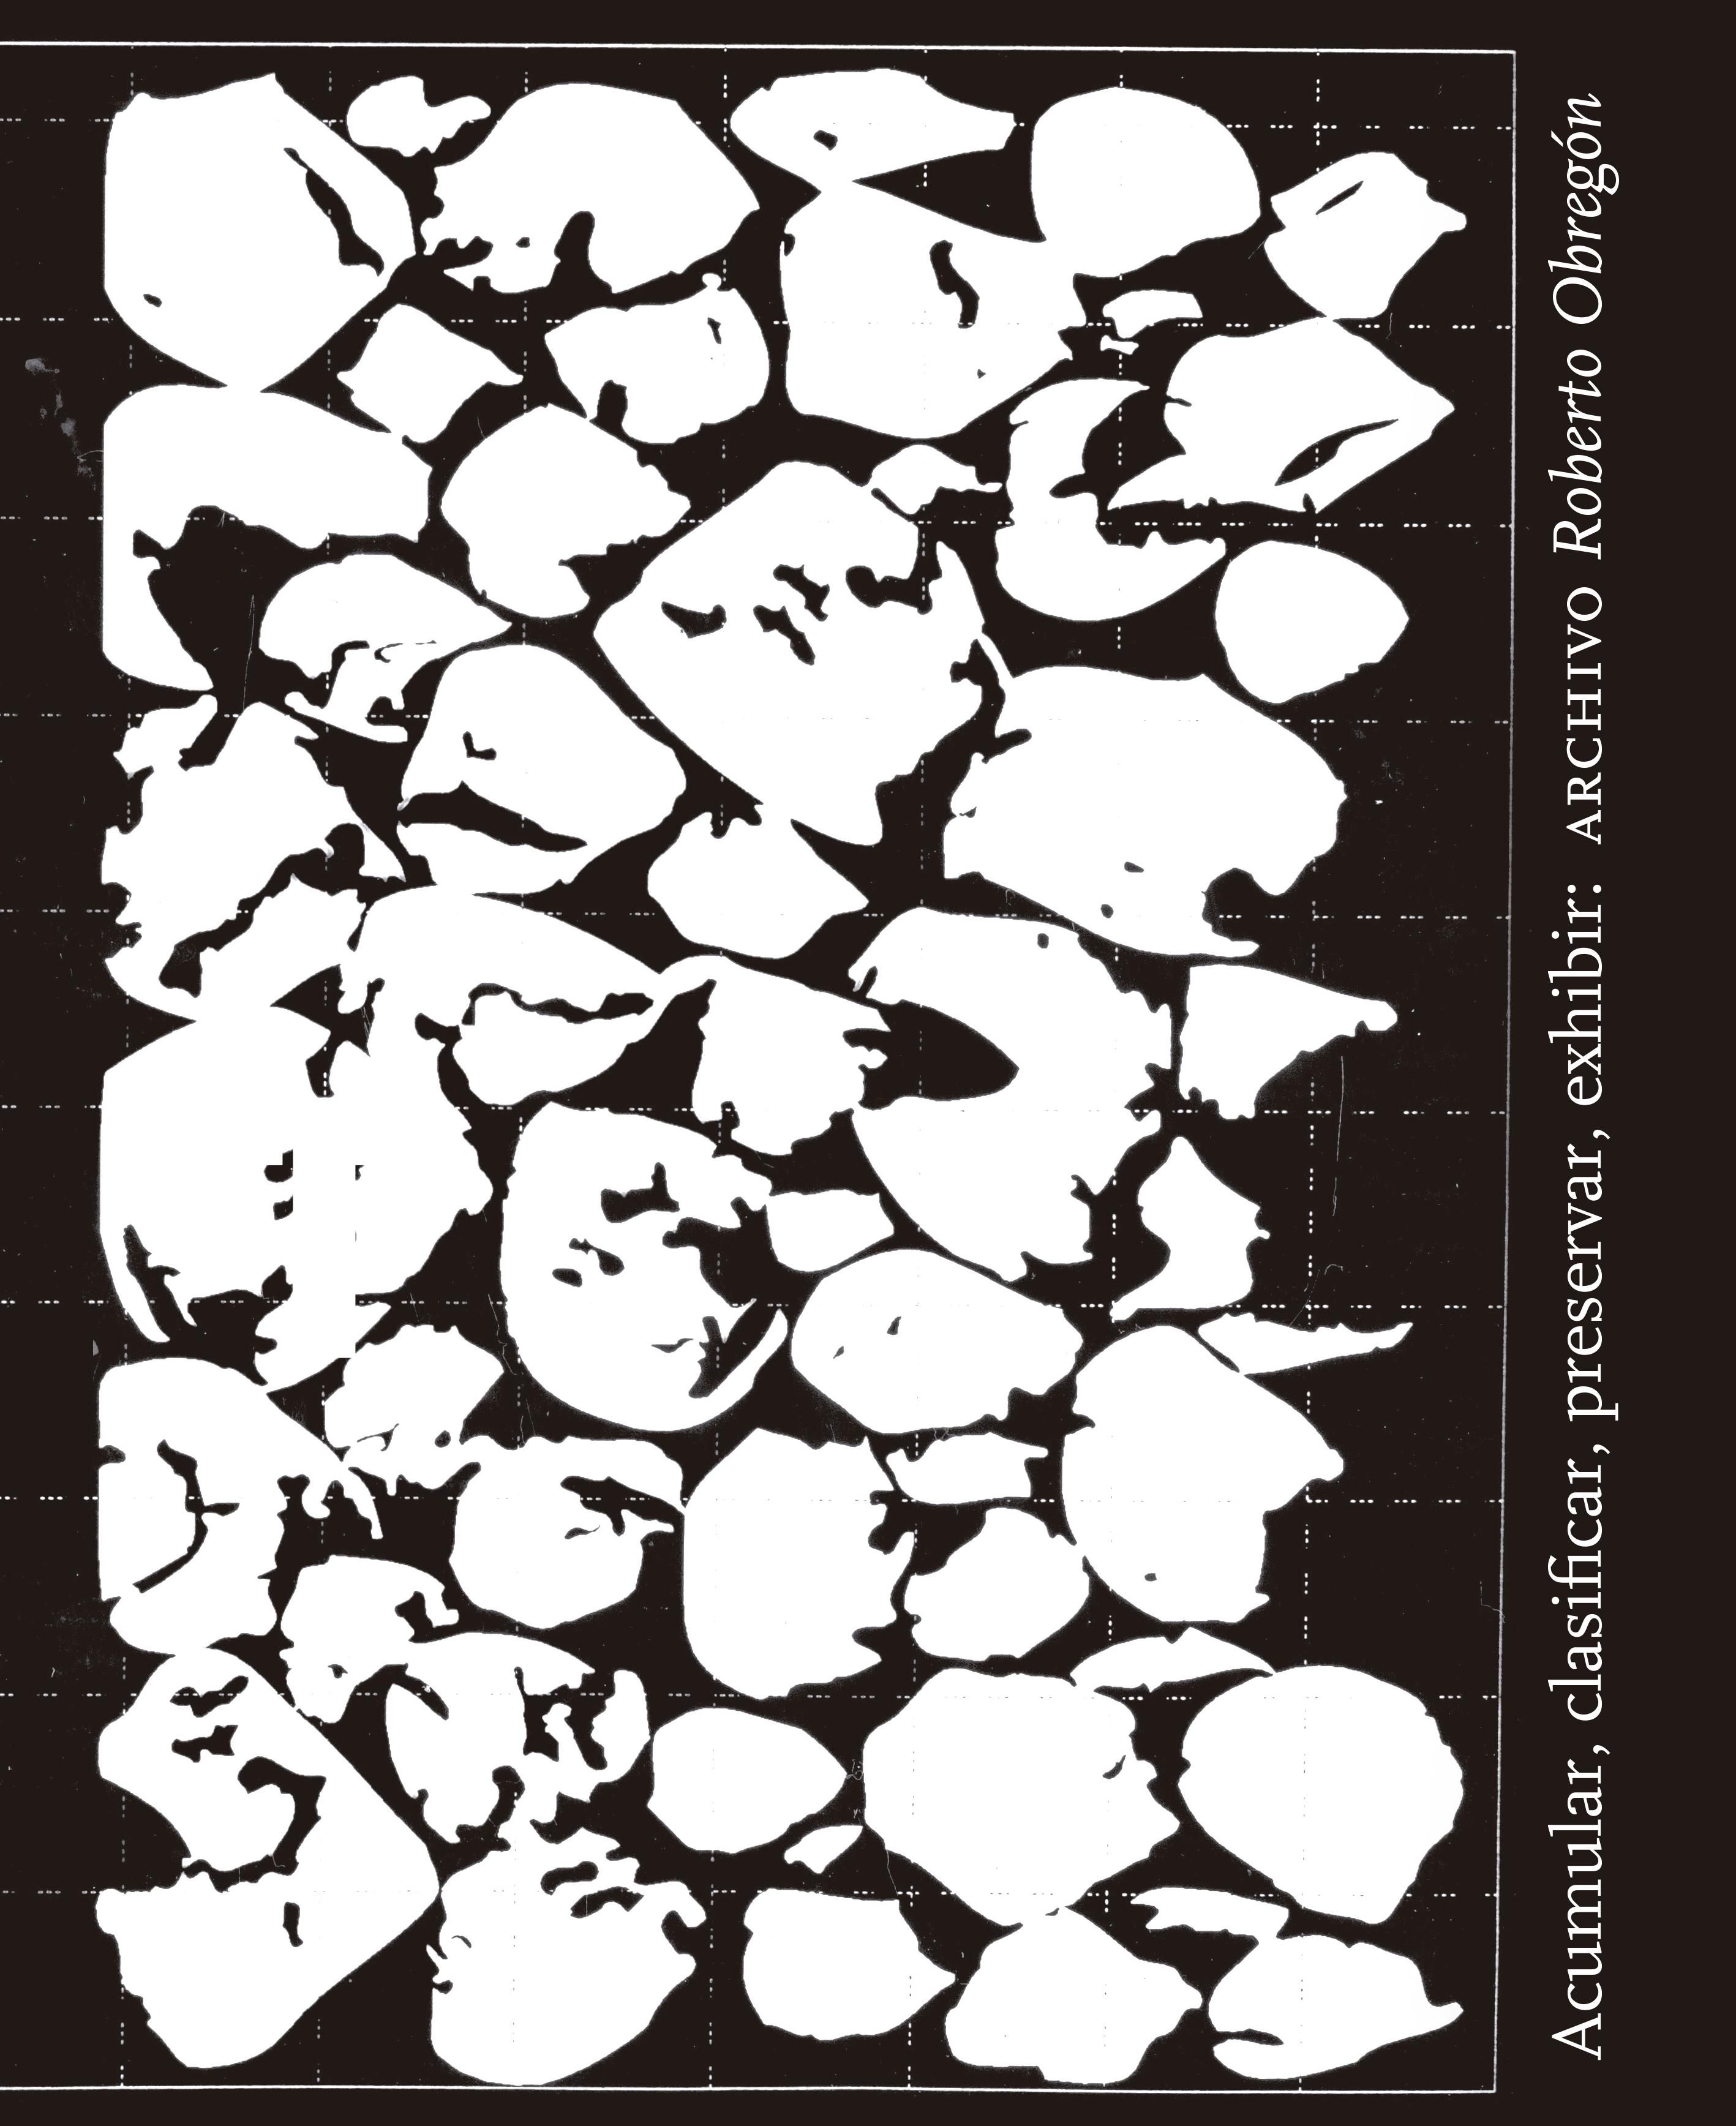 Acumular, clasificar, preservar, exhibir: Archivo Roberto Obregón